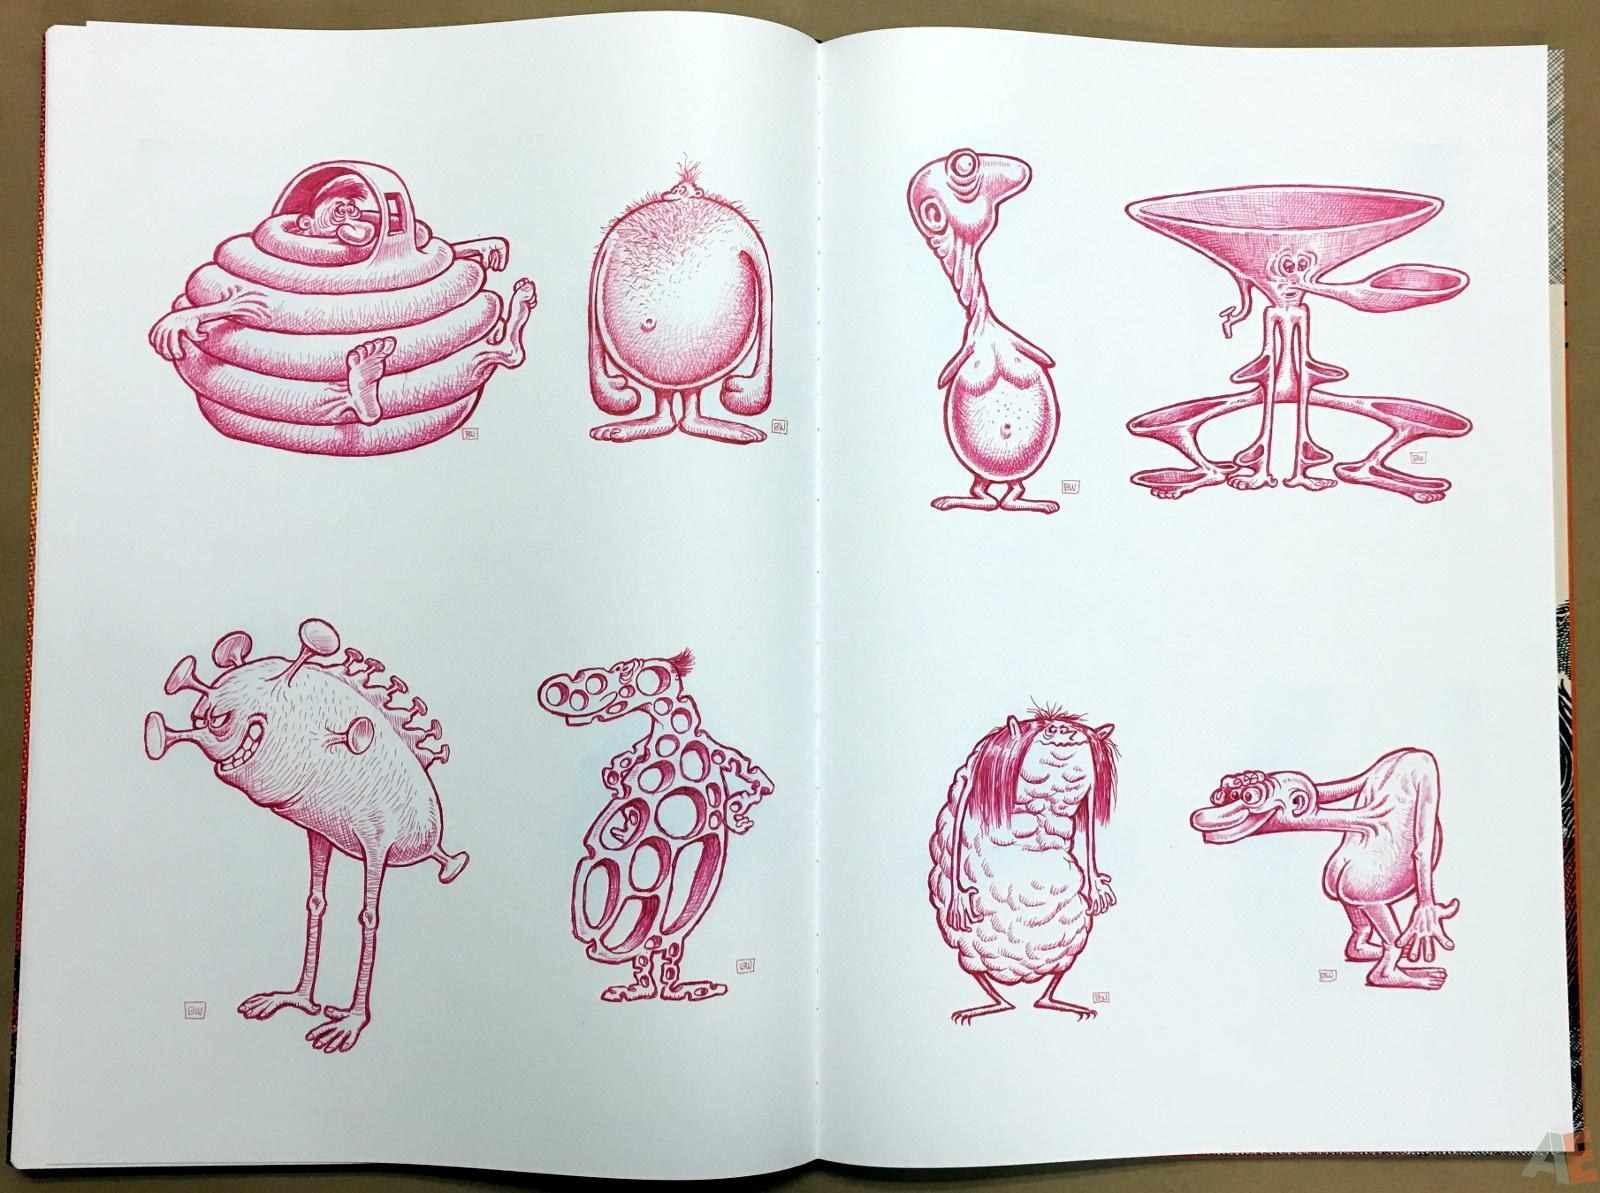 Basil Wolverton's Weird Worlds Artist's Edition 40